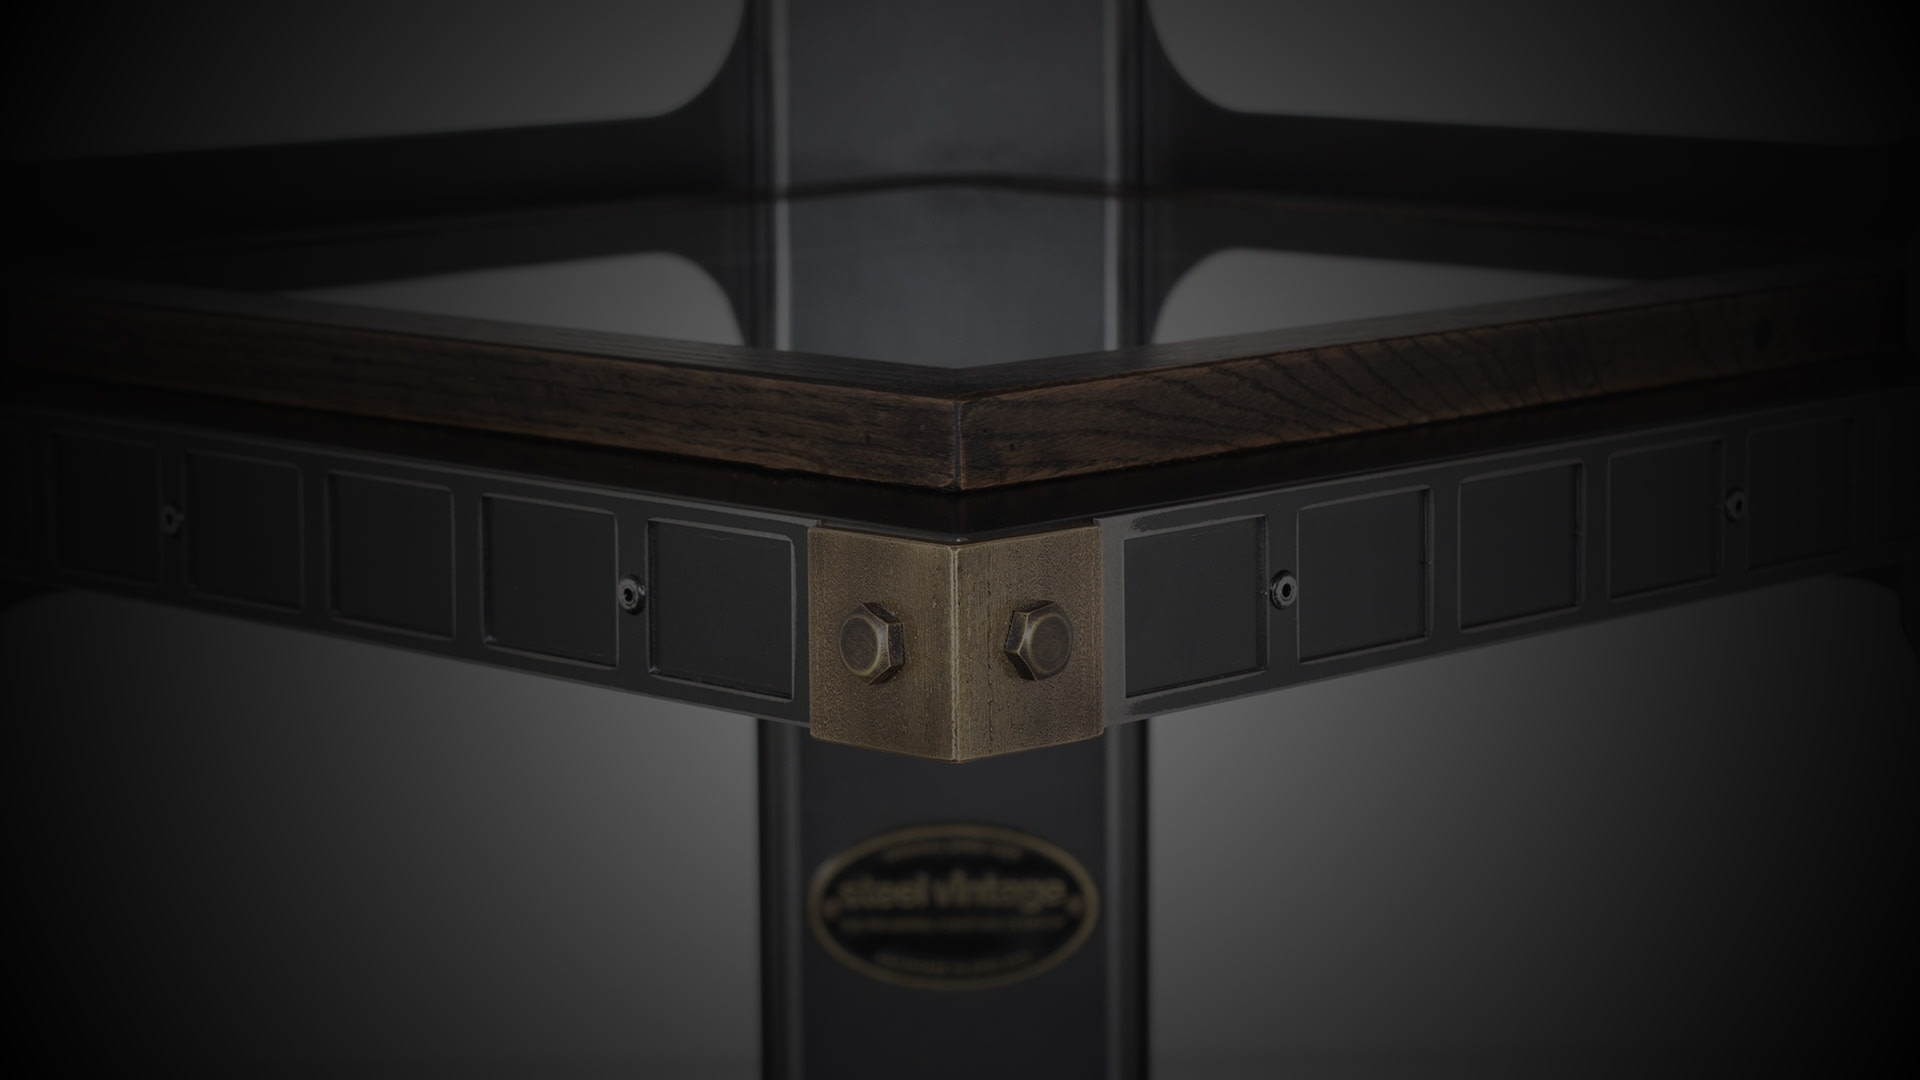 SV Brunel display cabinet closeup darkened